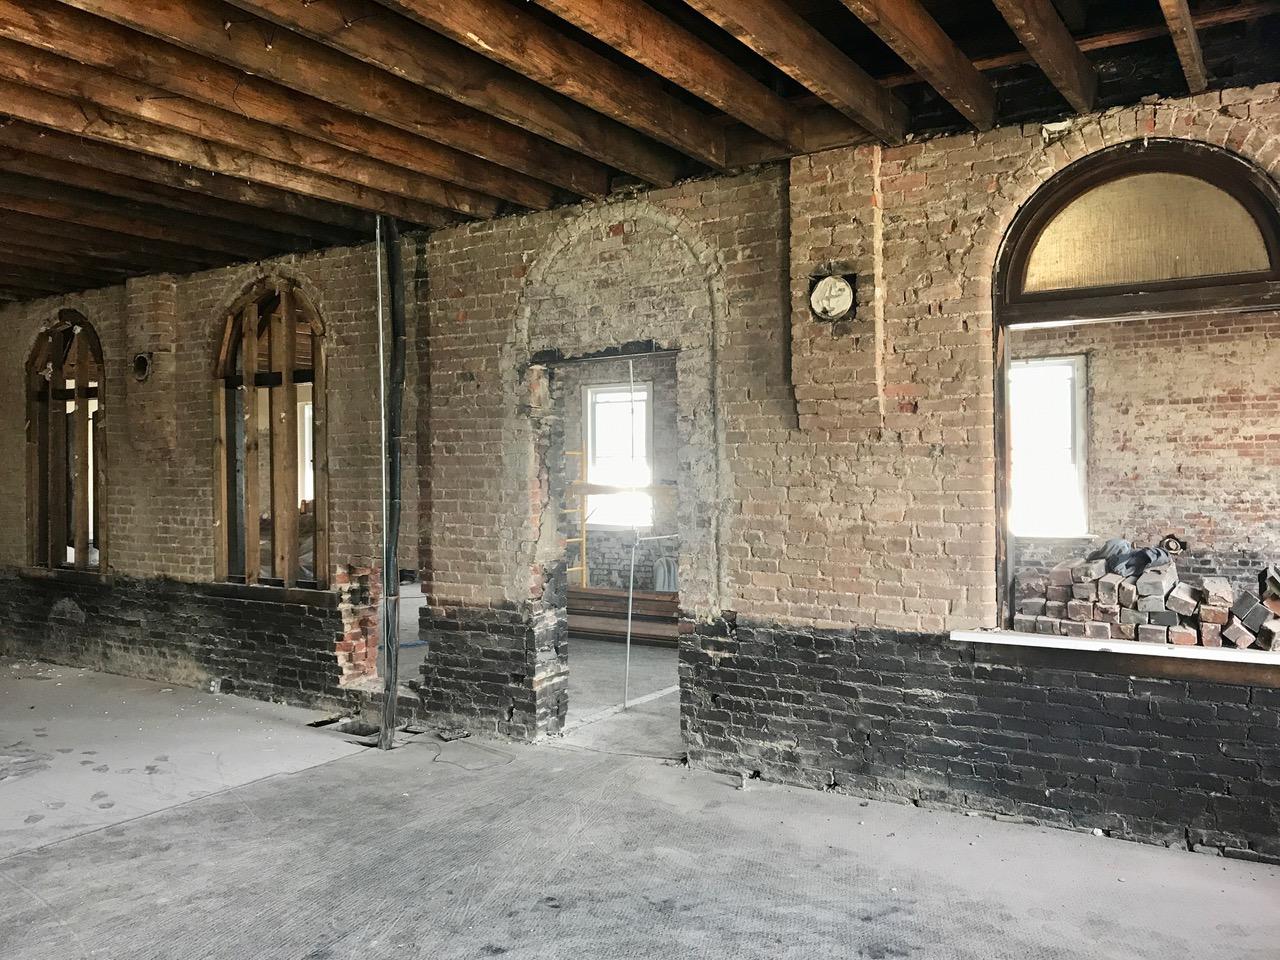 Brick in rough condition